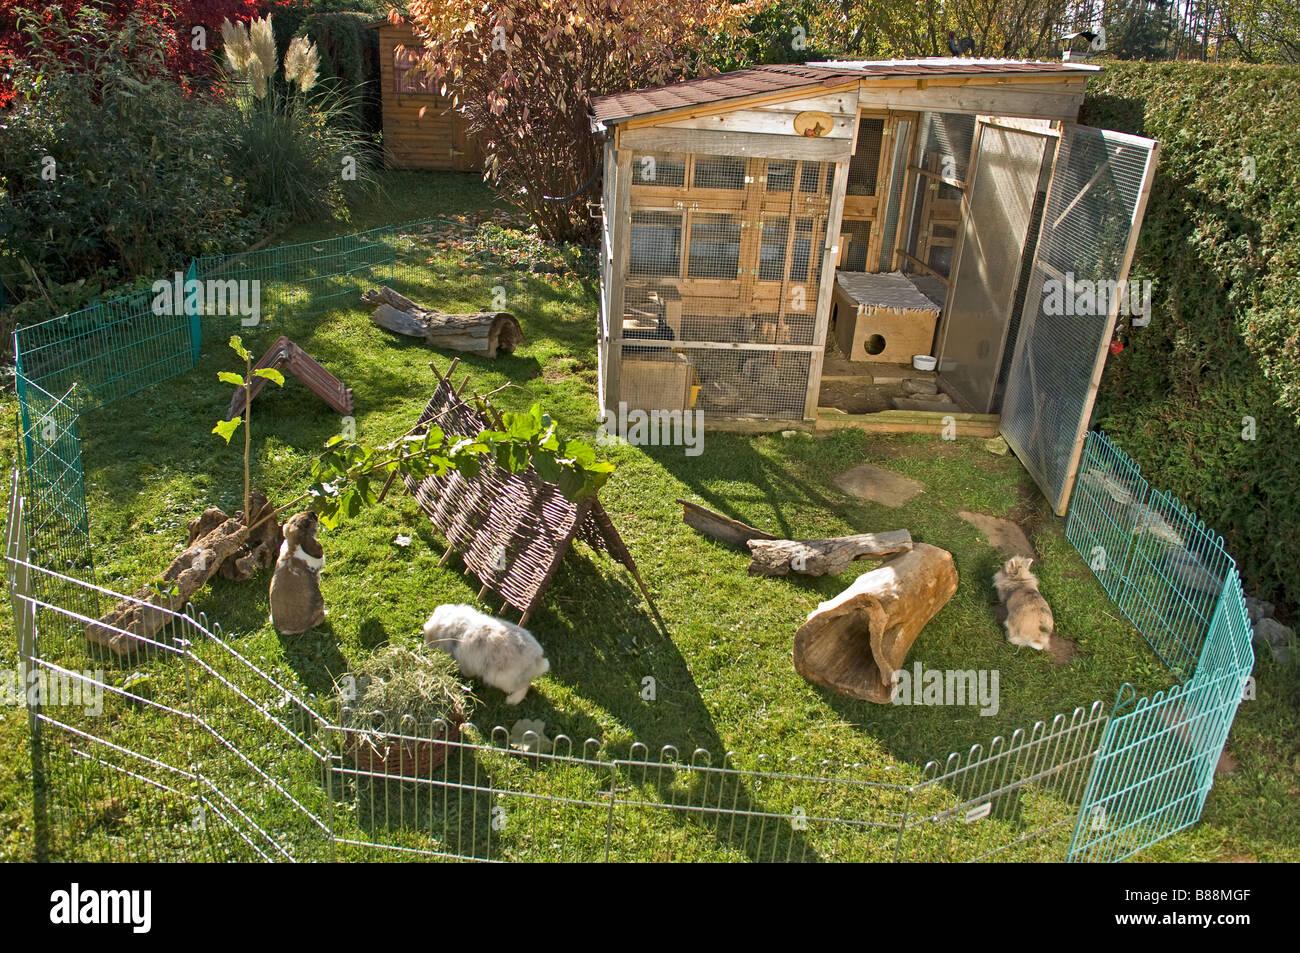 kaninchen im au engehege stockfoto bild 22319375 alamy. Black Bedroom Furniture Sets. Home Design Ideas